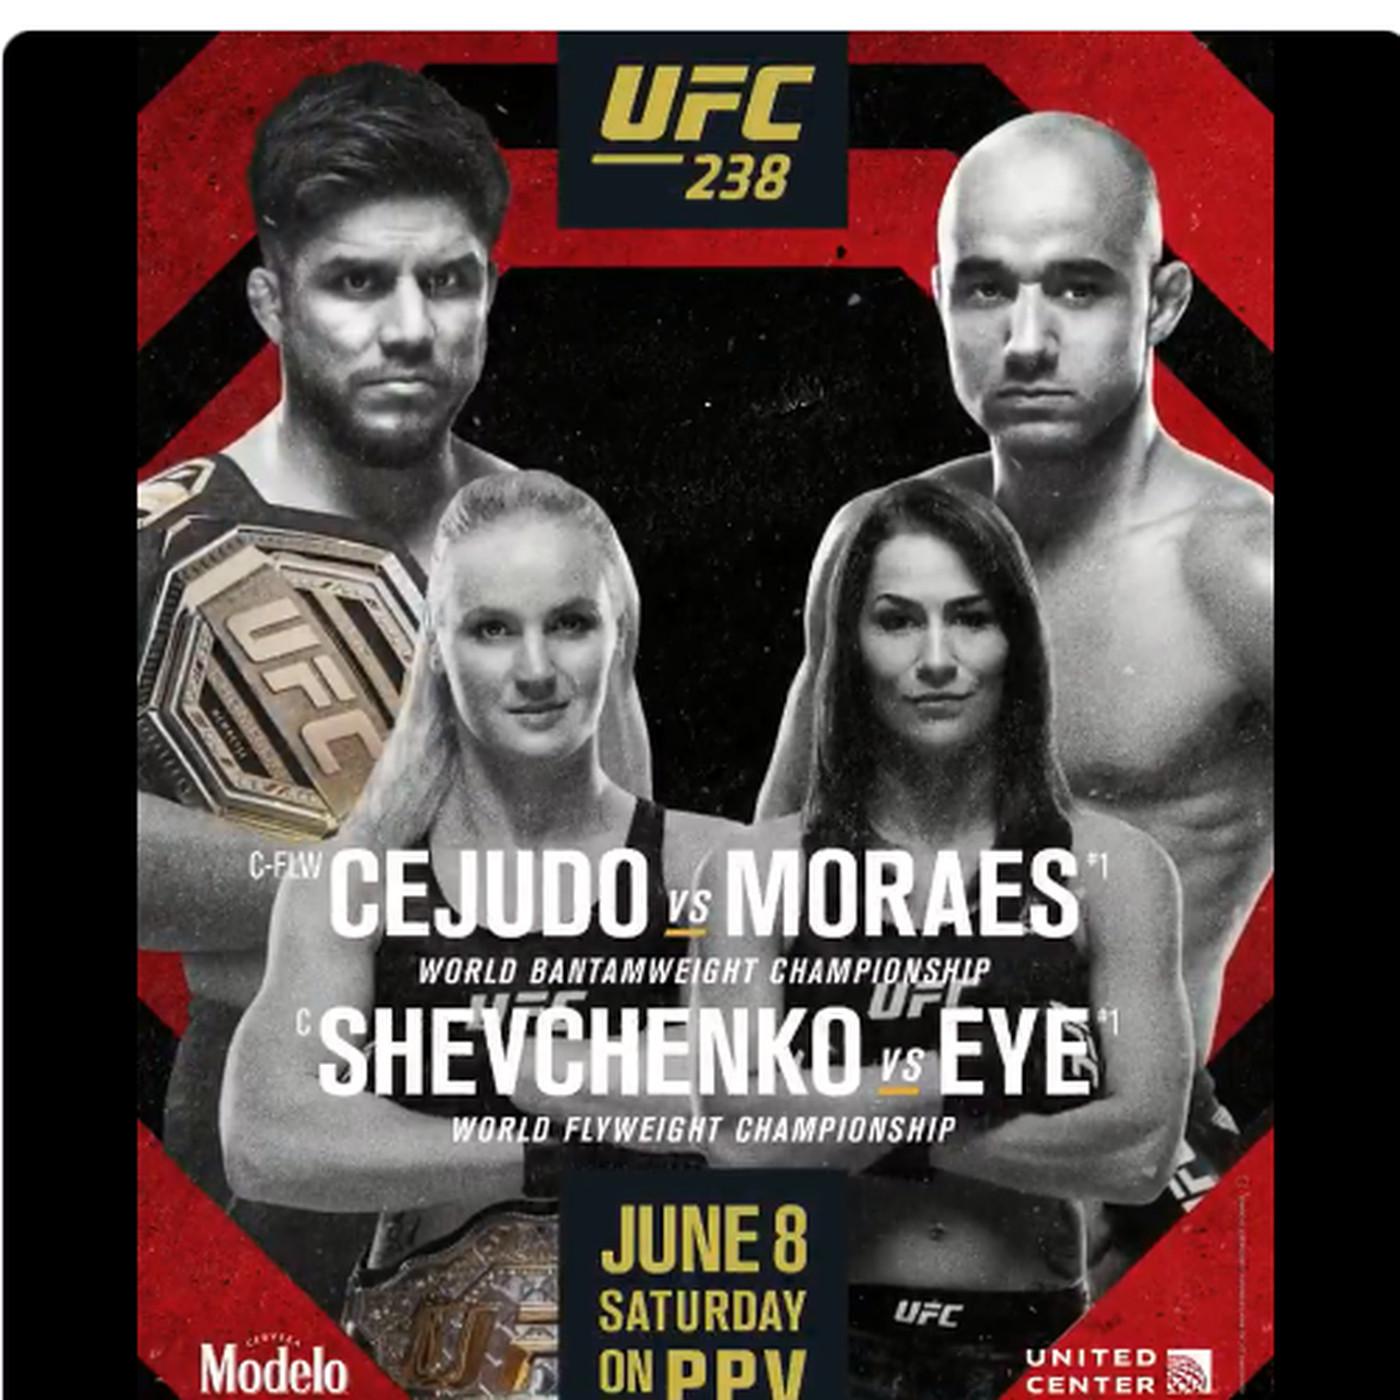 Pic: Official UFC 238 poster d...